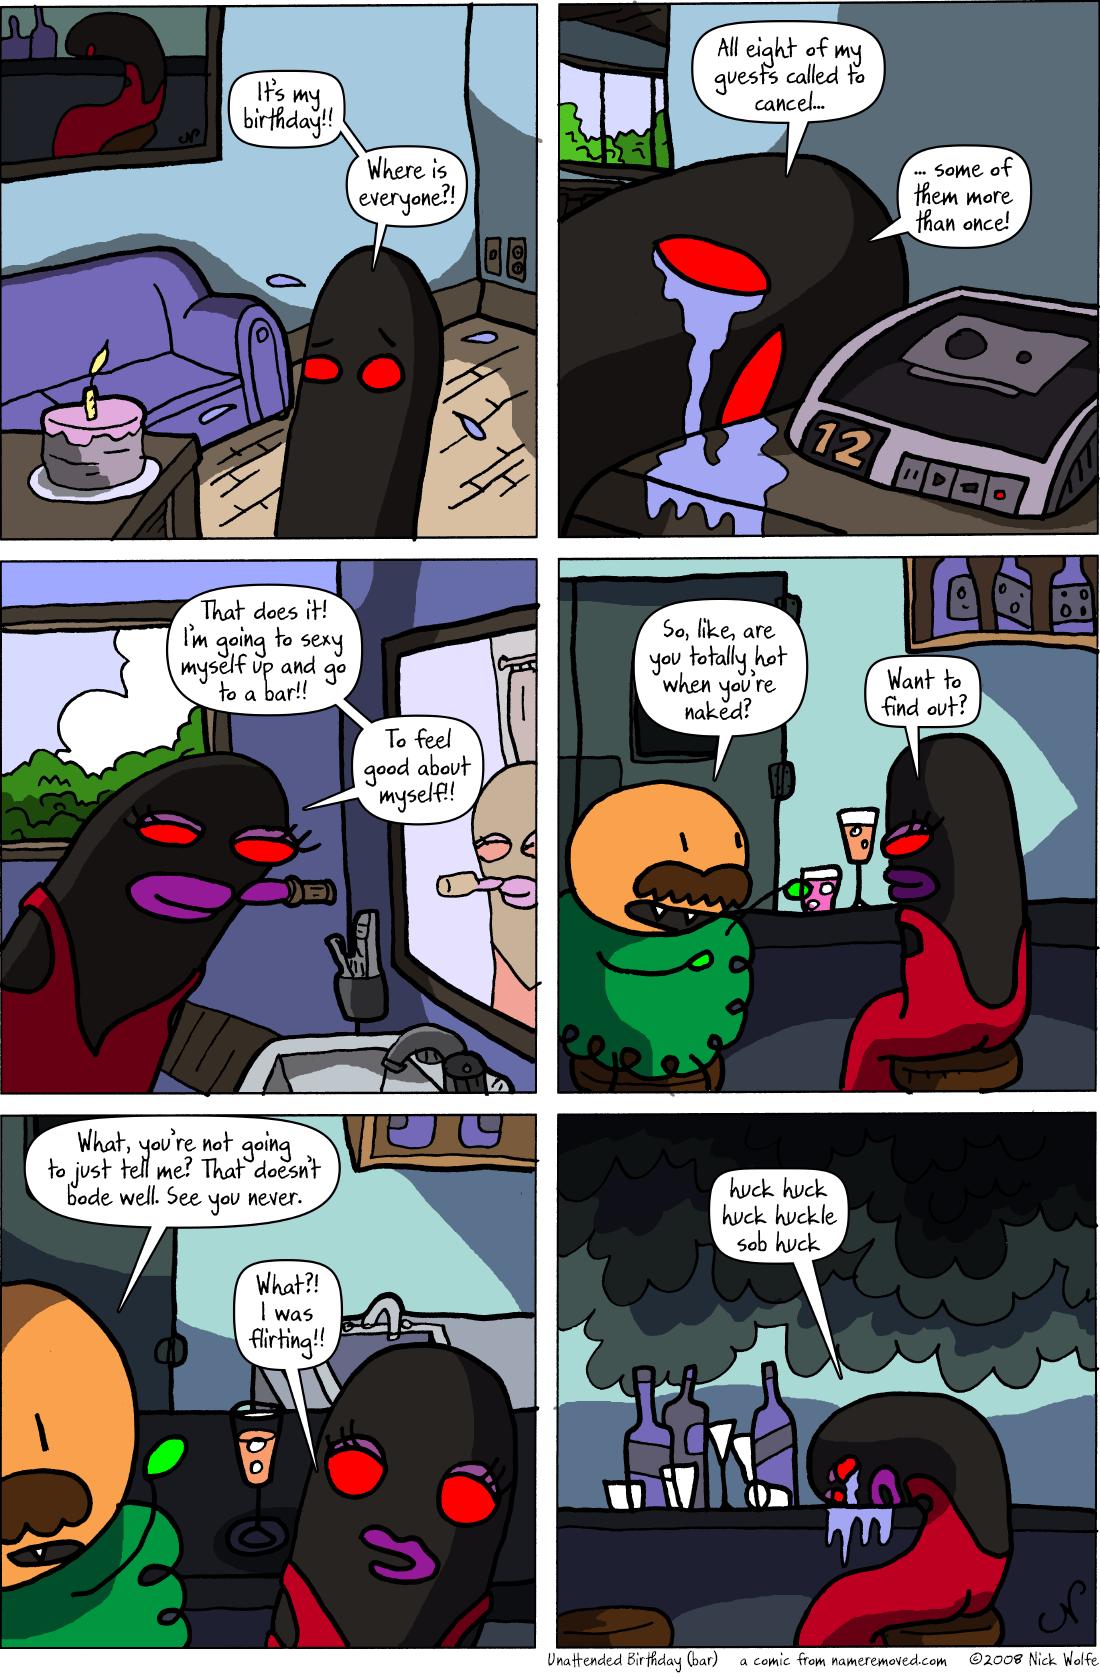 Unattended Birthday (bar)